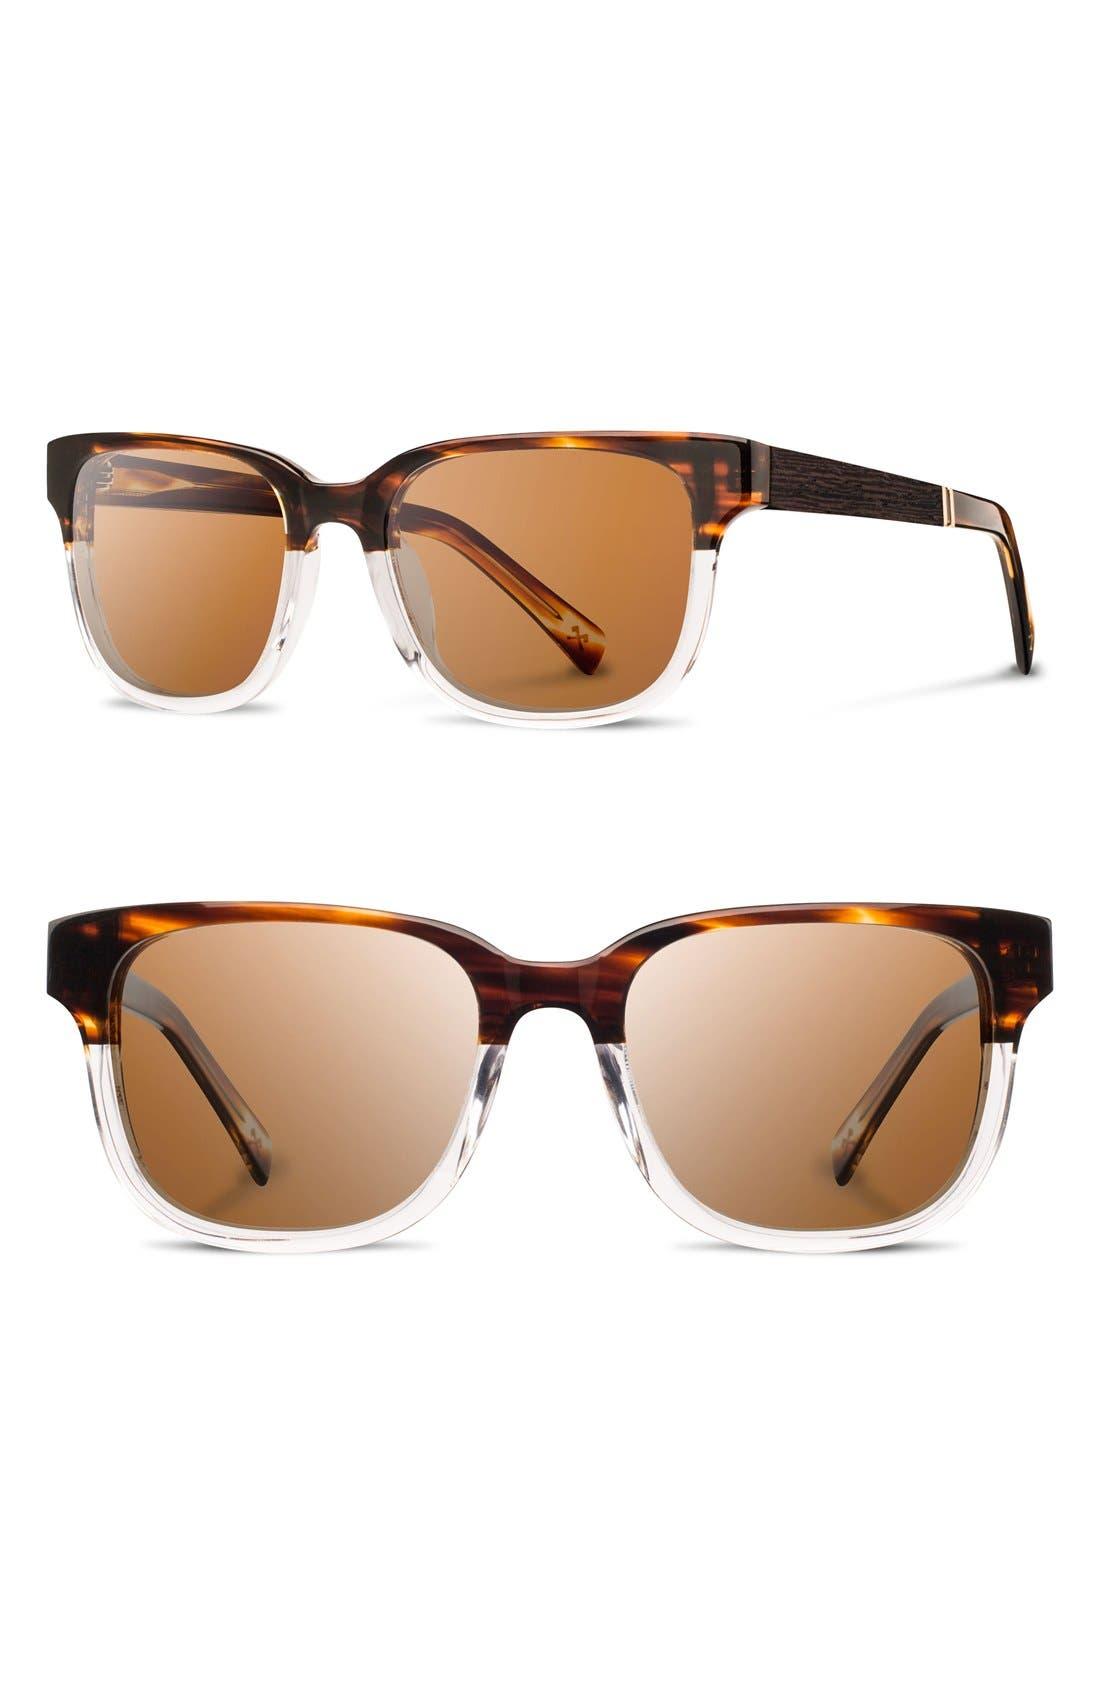 Main Image - Shwood 'Prescott' 52mm Acetate & Wood Sunglasses